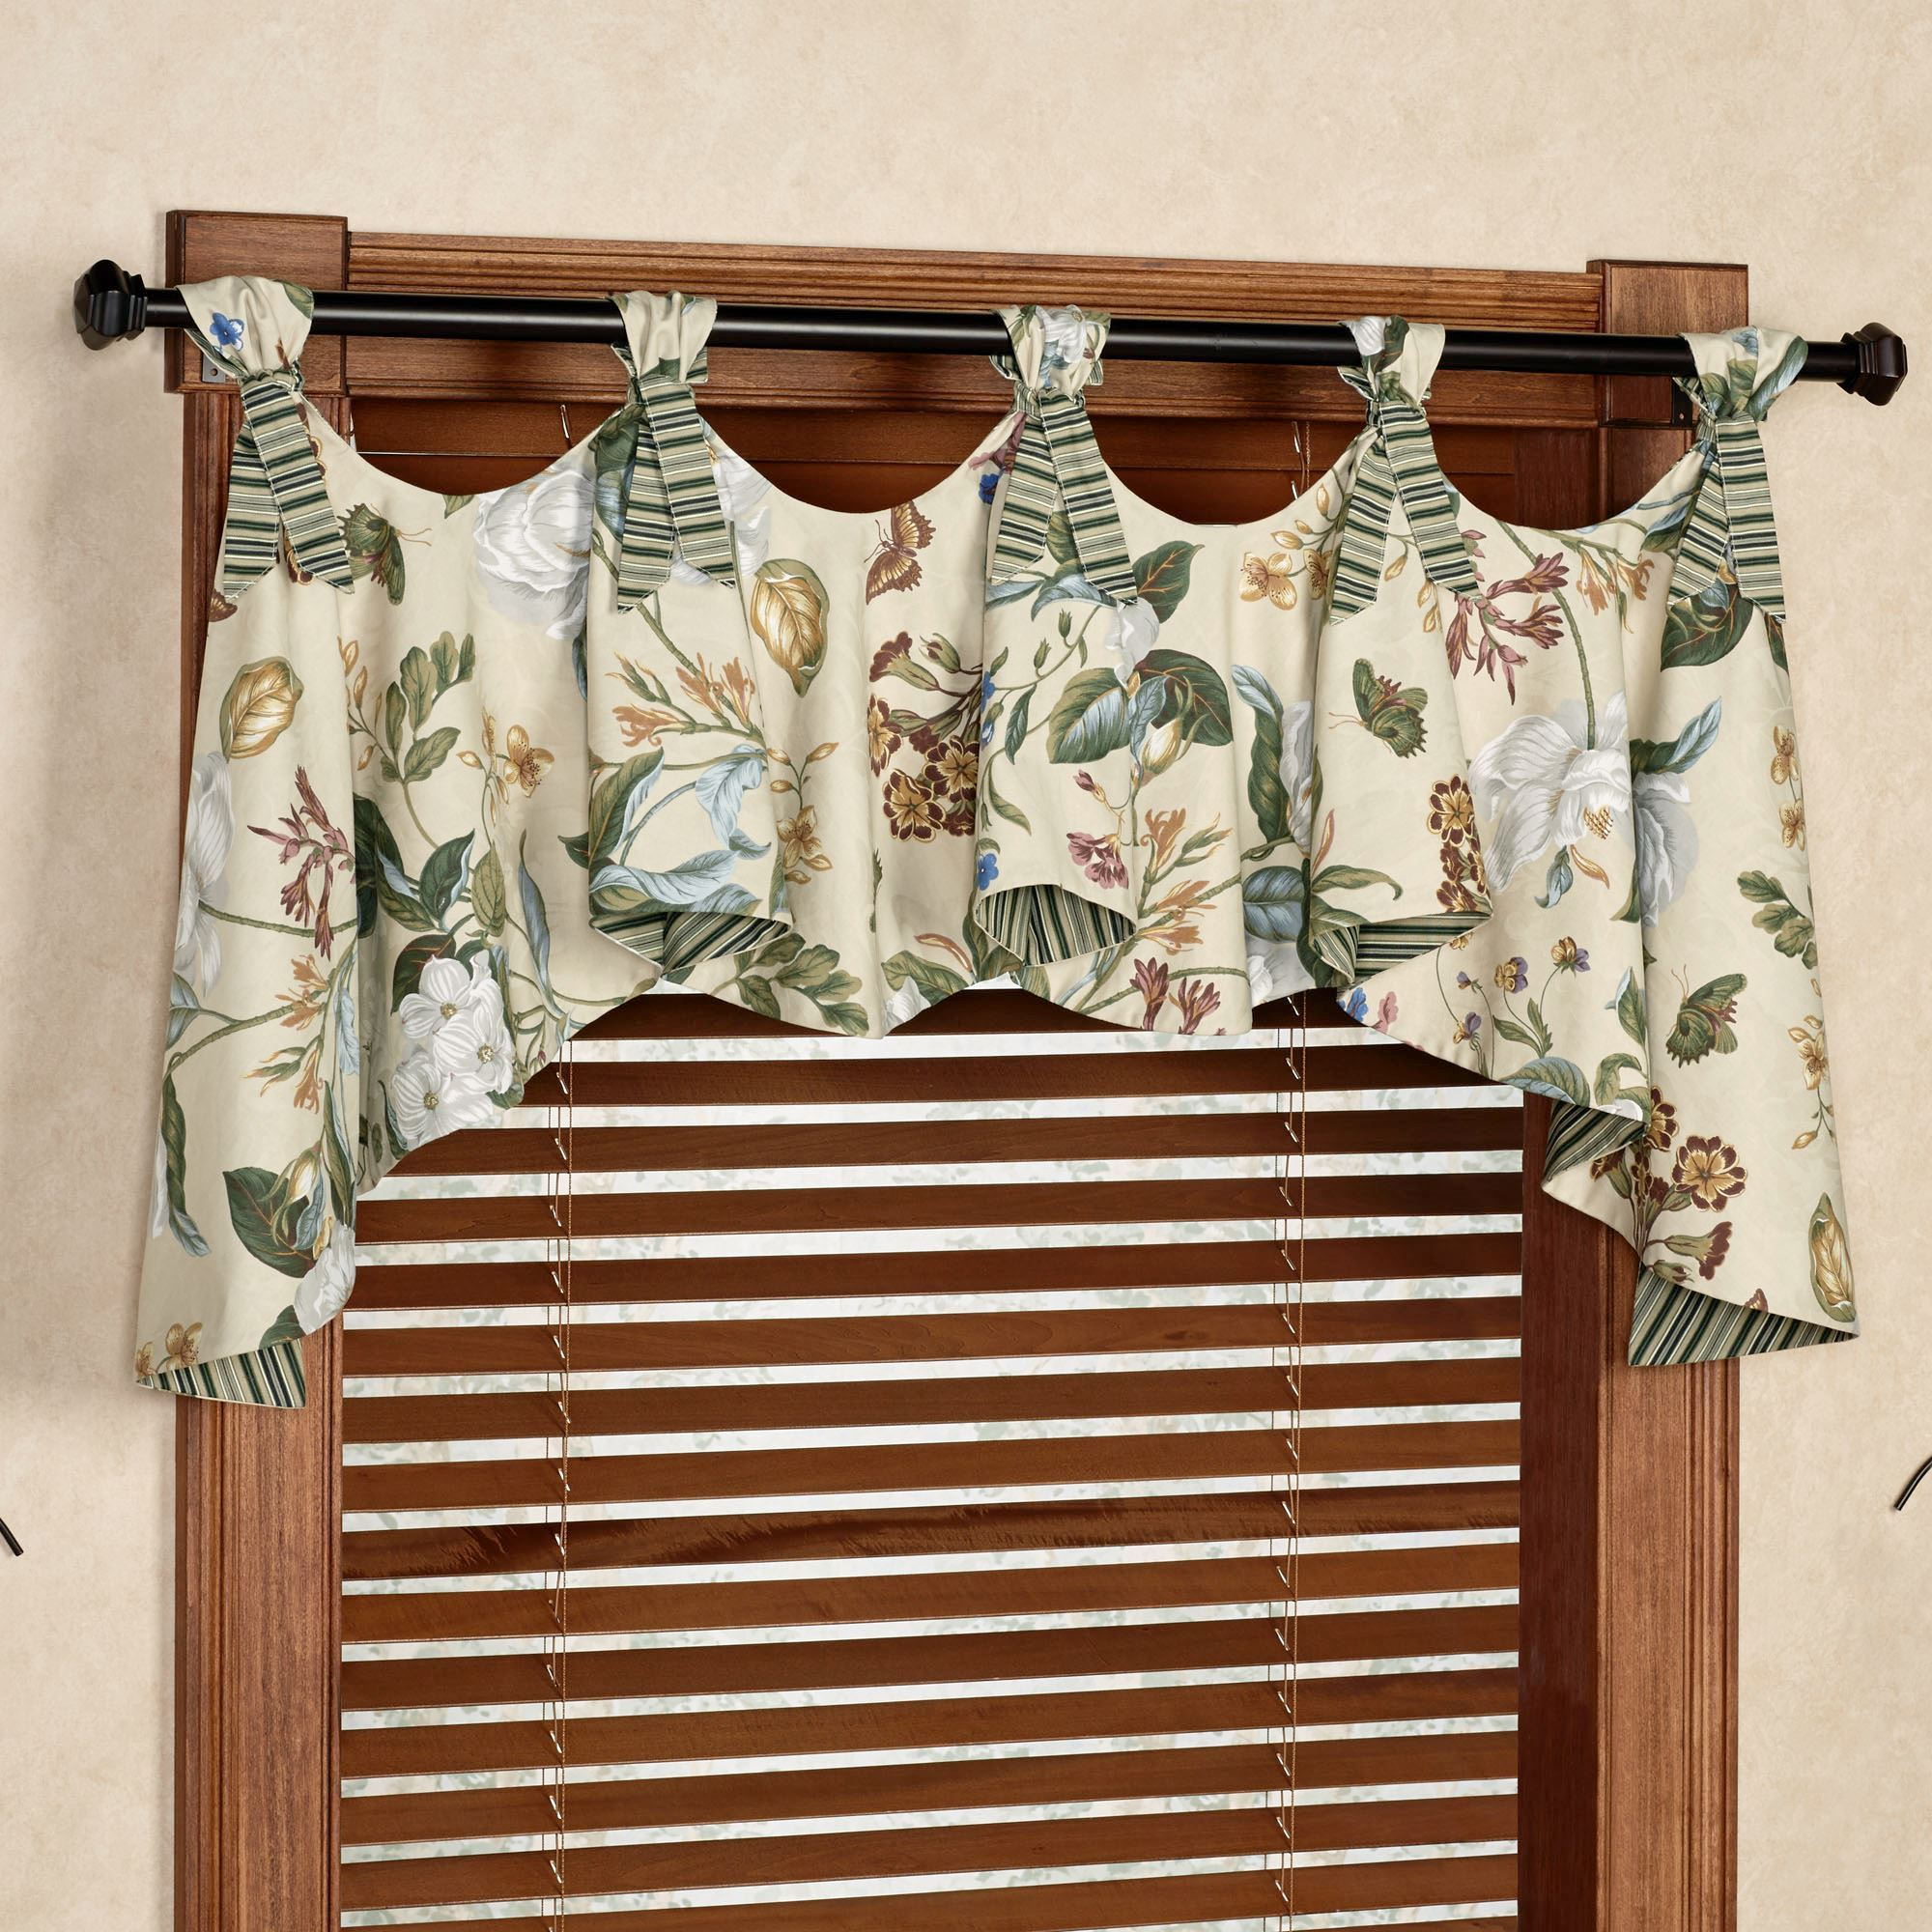 curtain valances garden images iii austrian valance parchment 64 x 28 VEWEOHQ